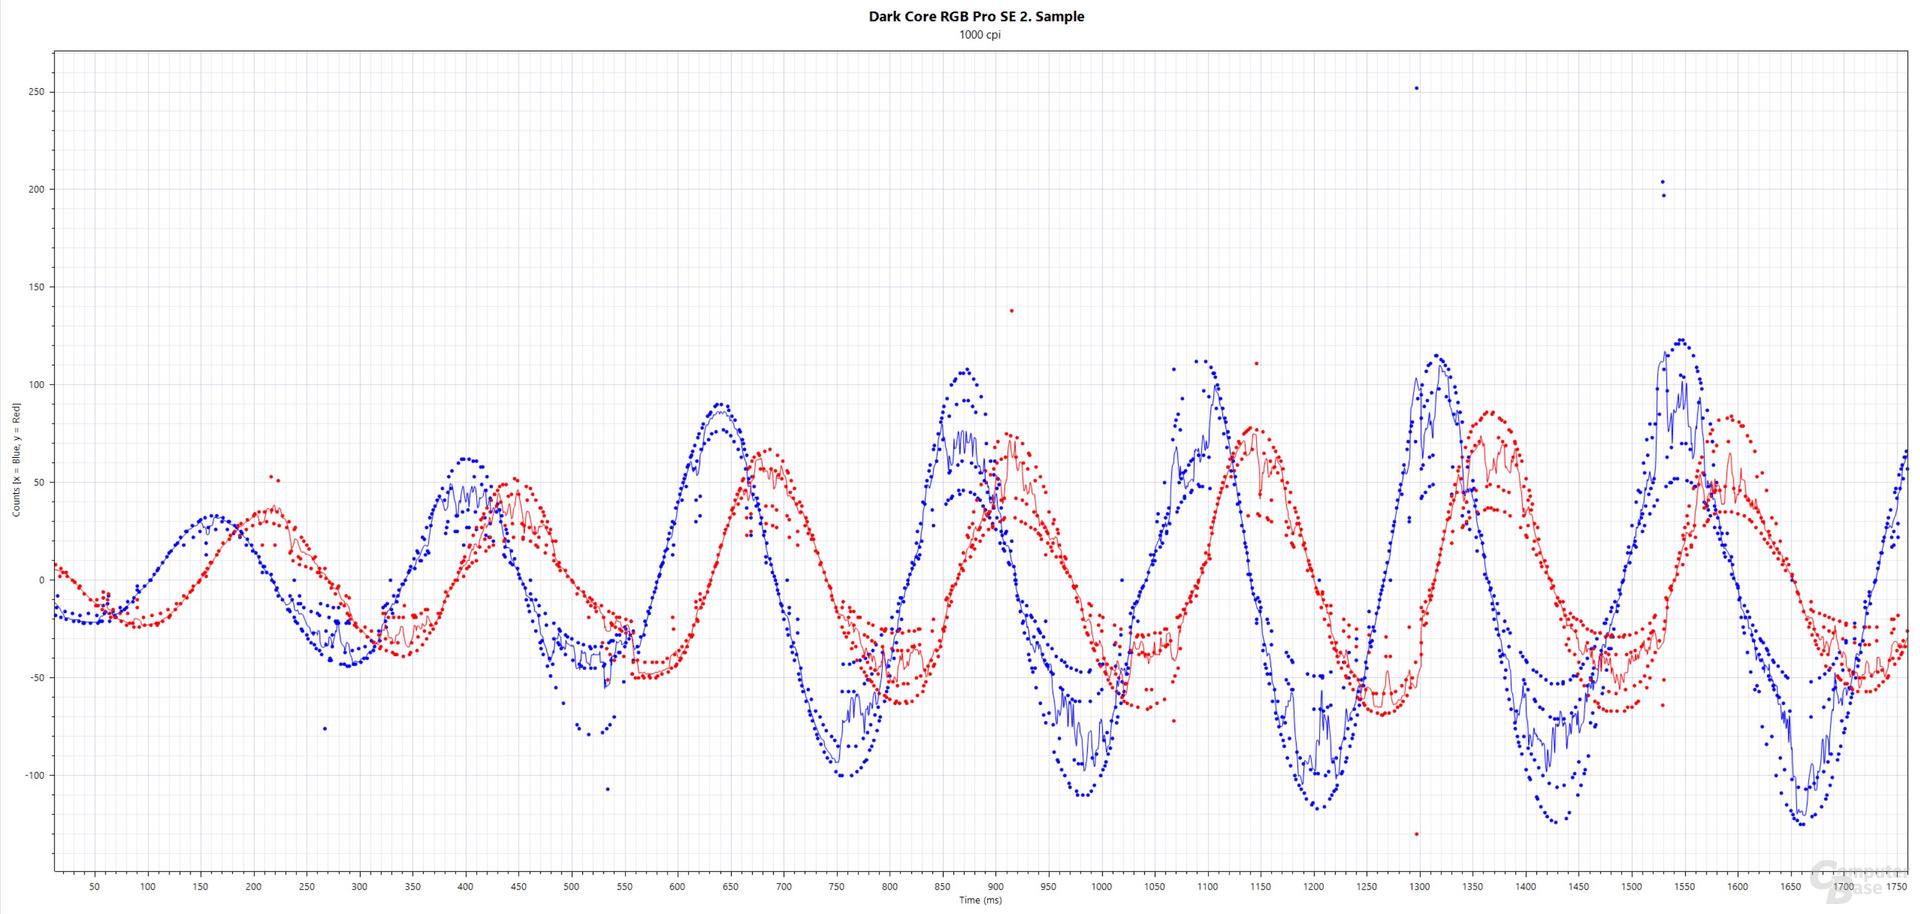 Blau: xCounts(ms), Rot: yCounts(ms); Corsair Dark Core RGB Pro SE (2. Testmuster, PixArt PAW-3392, 1.000 cpi, 2.000 Hertz, Stoffmauspad)